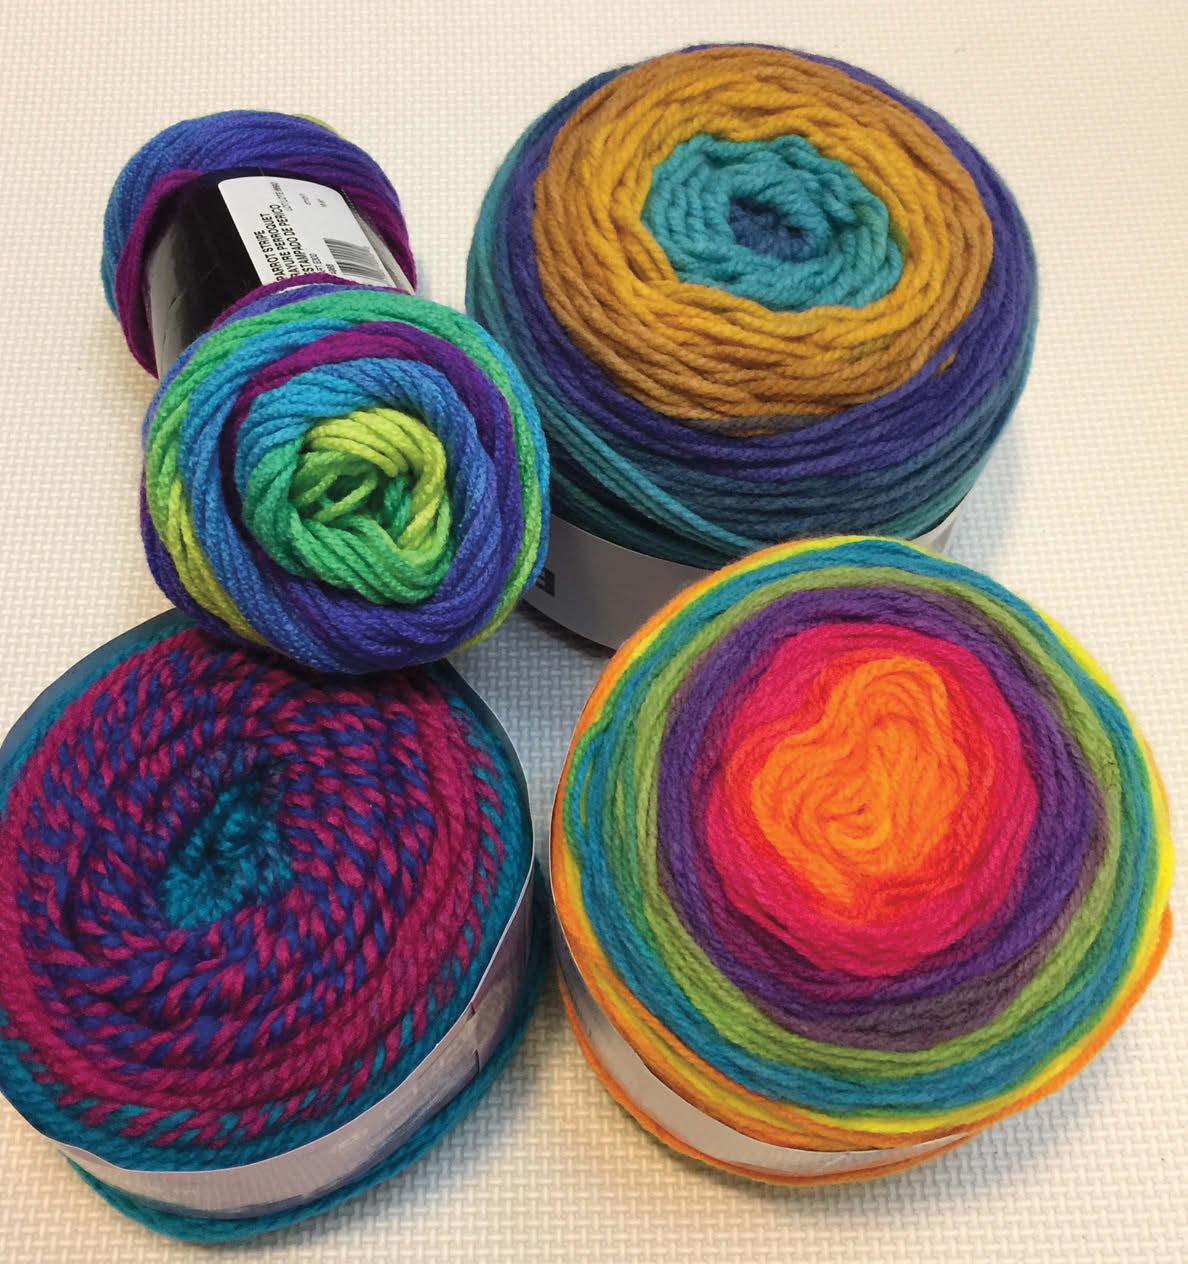 Crocheting With Self-Striping Yarns